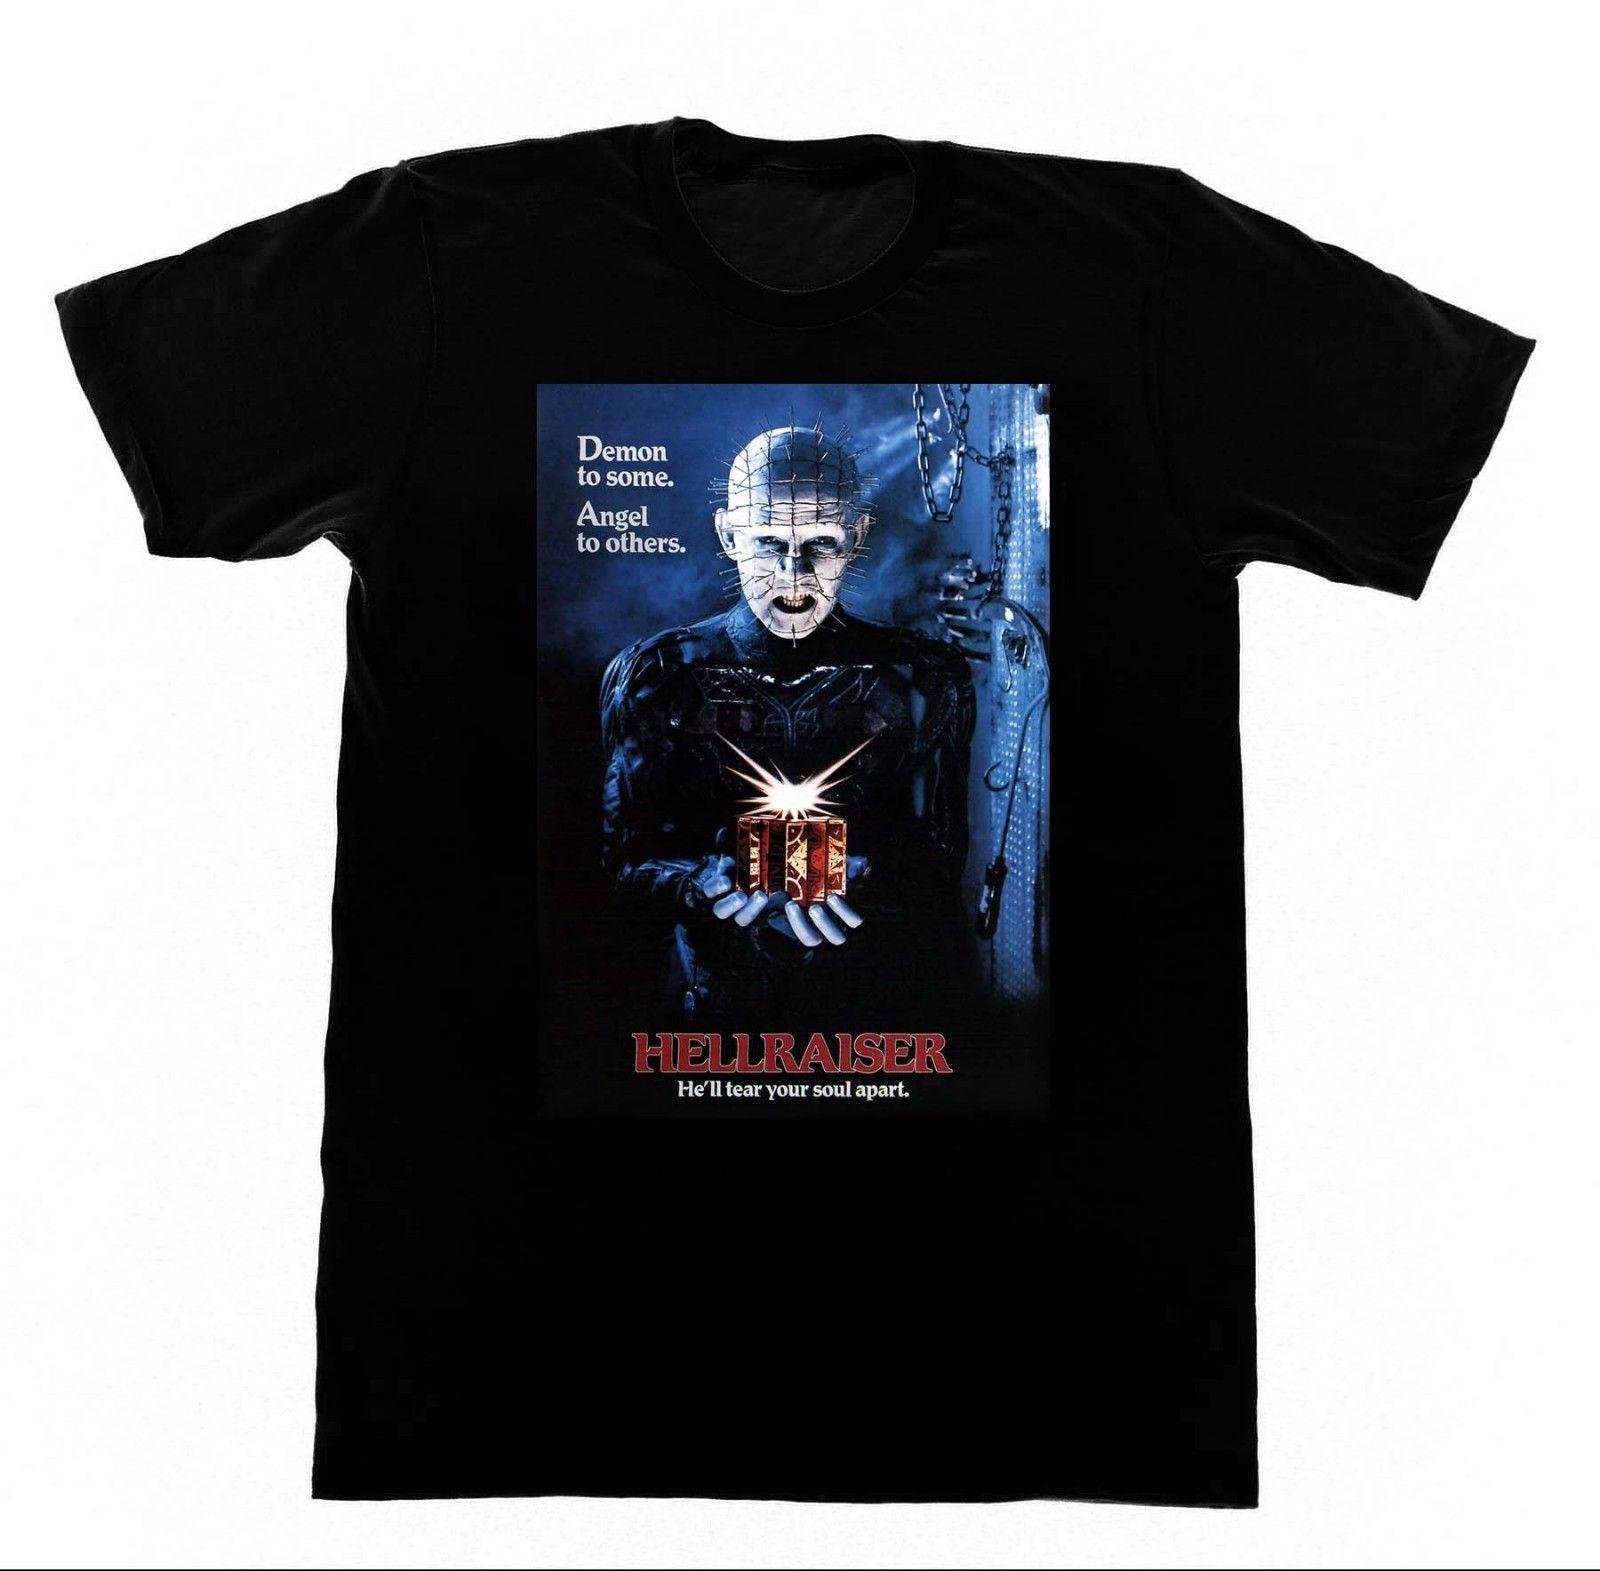 Hellraiser Shirt 172 T Pinhead Clive Barker 80s Cult Horror Movie Film High Quality Men T-Shirts Tops O-Neck Shirts